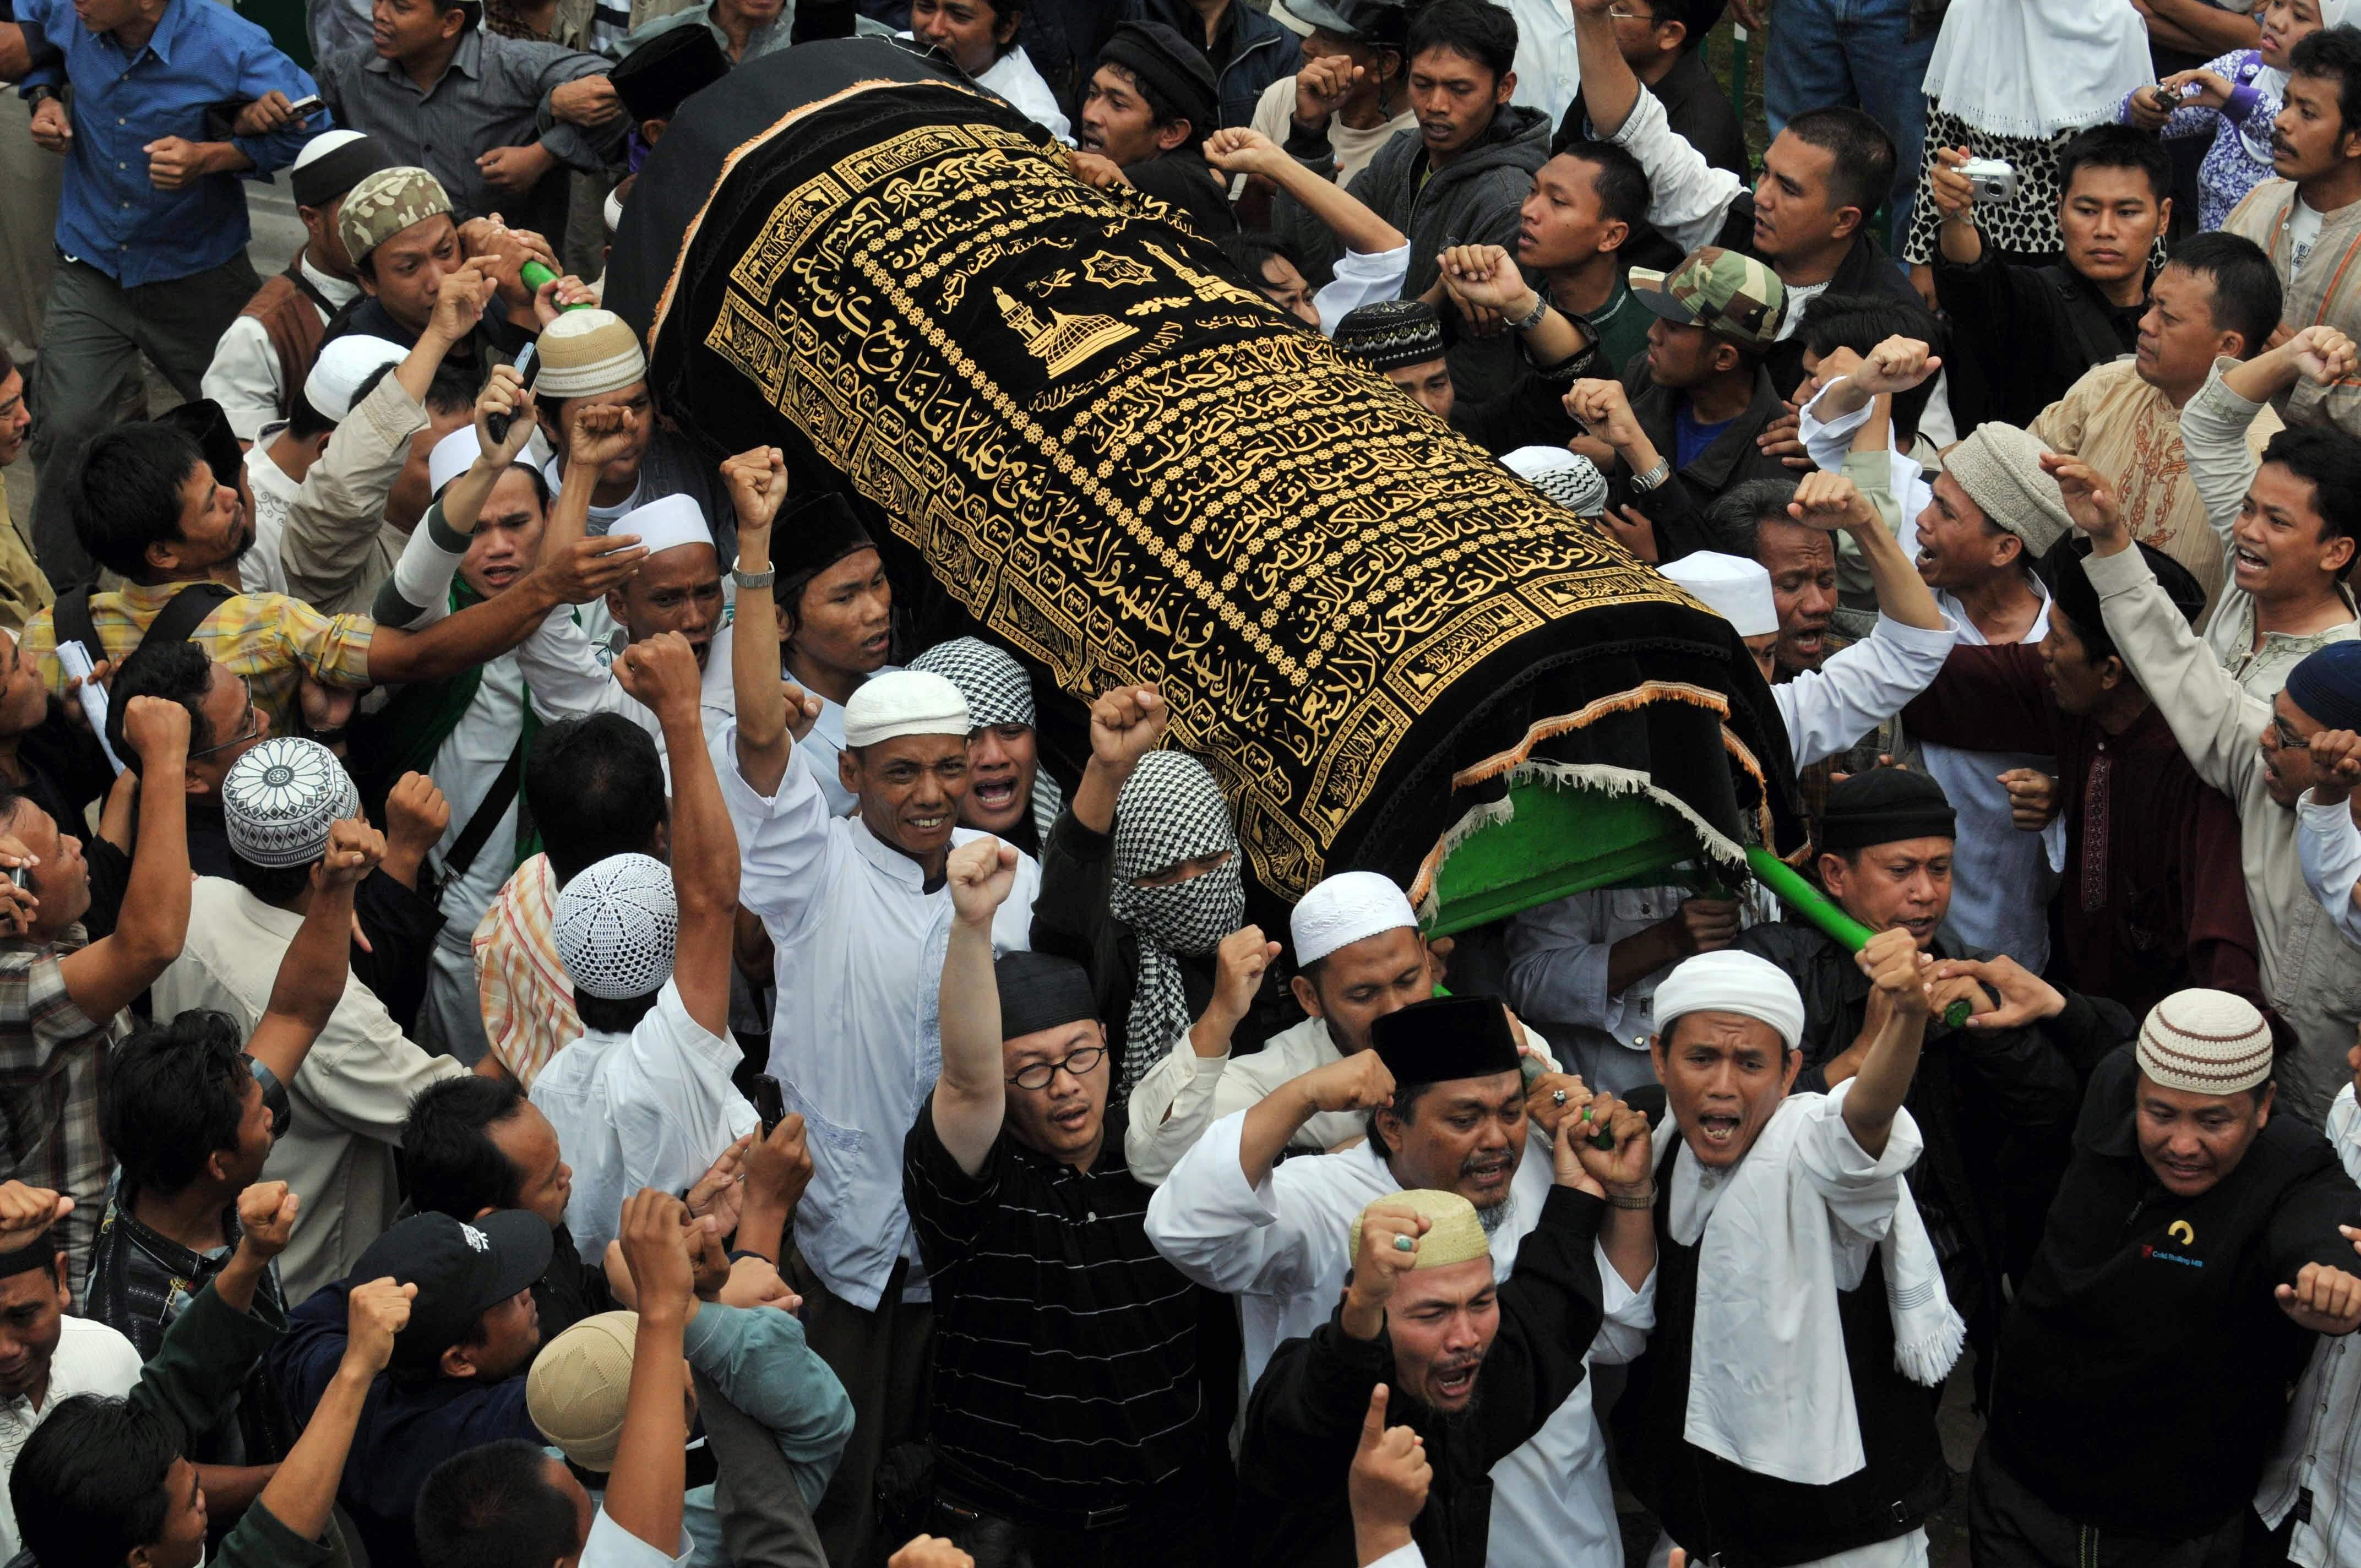 Imam Samudra Cicit Mujahid Yang Meraih Syahid VOA ISLAMCOM